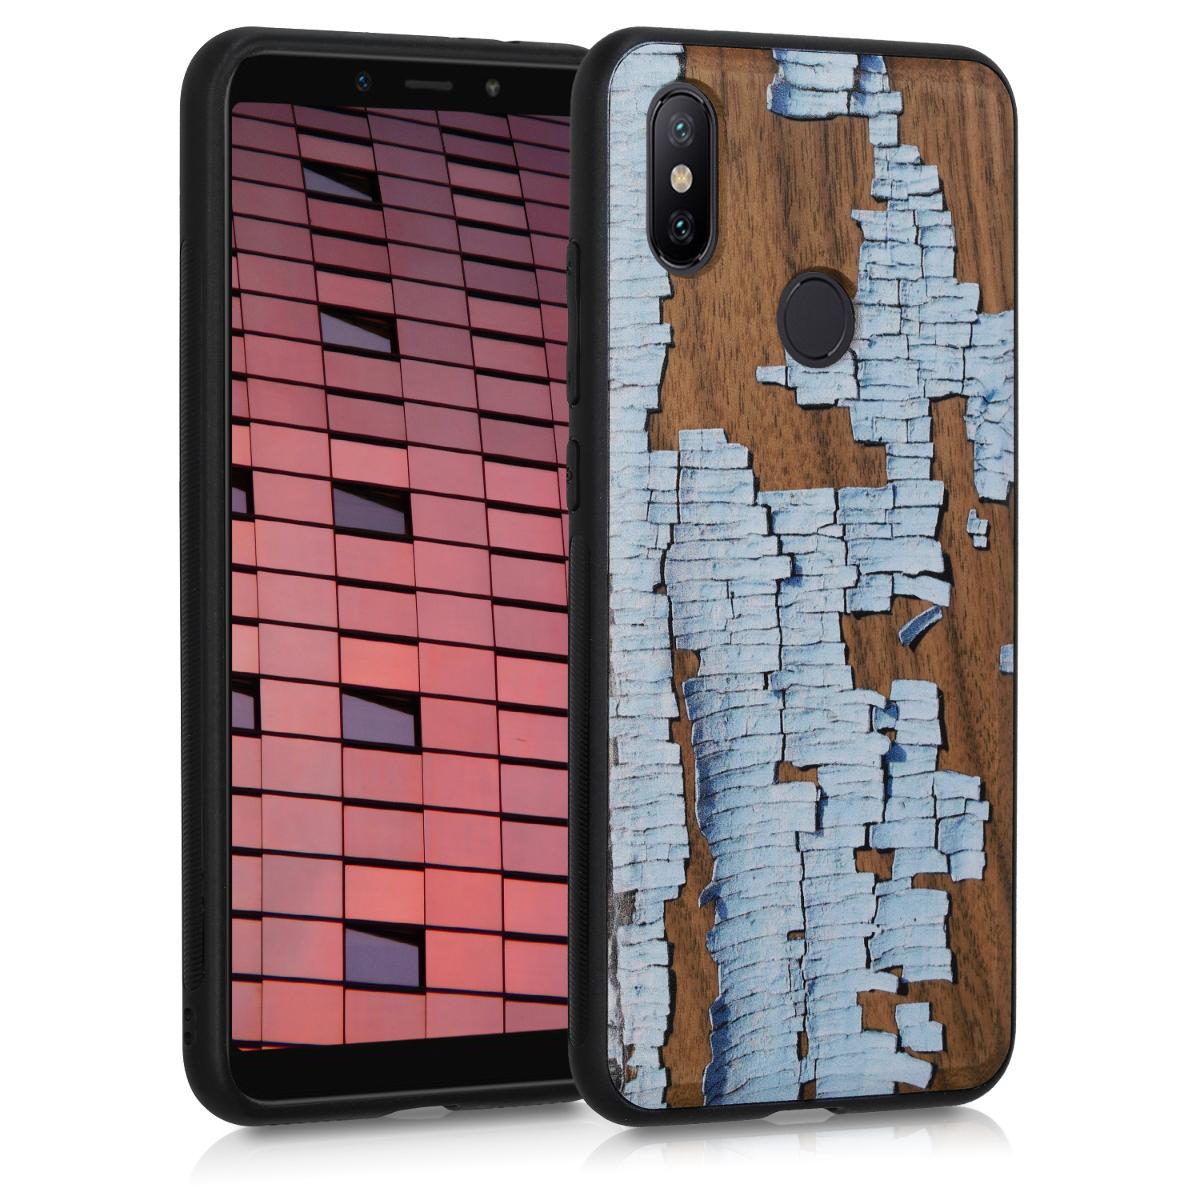 KW Σκληρή Ξύλινη Θήκη Xiaomi Mi 6X / Mi A2 - Watercolor Waves (47748.02)